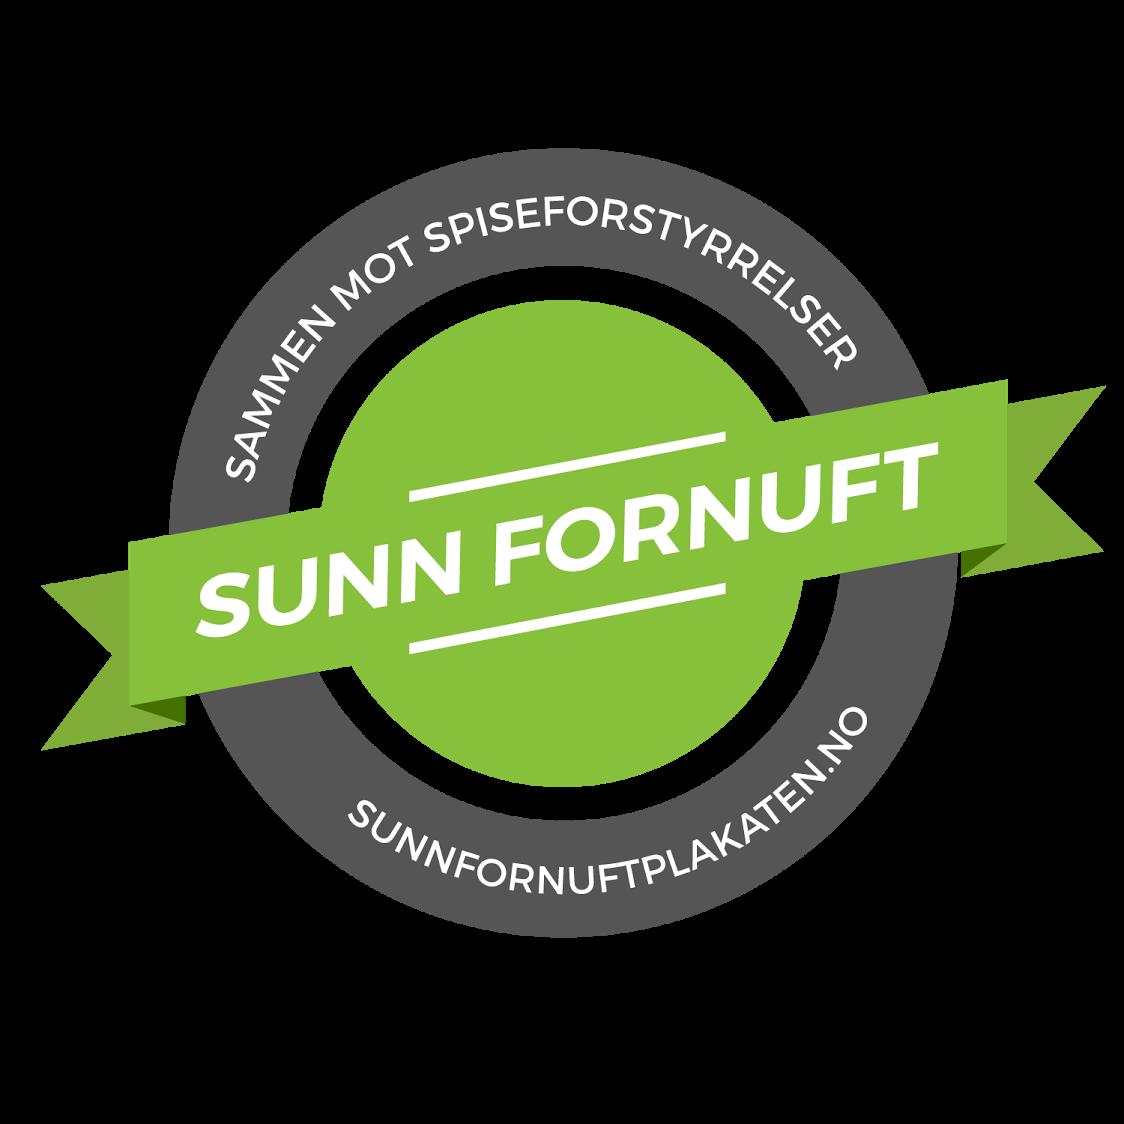 Green Bonanza følger Sunn Fornuft-plakaten!